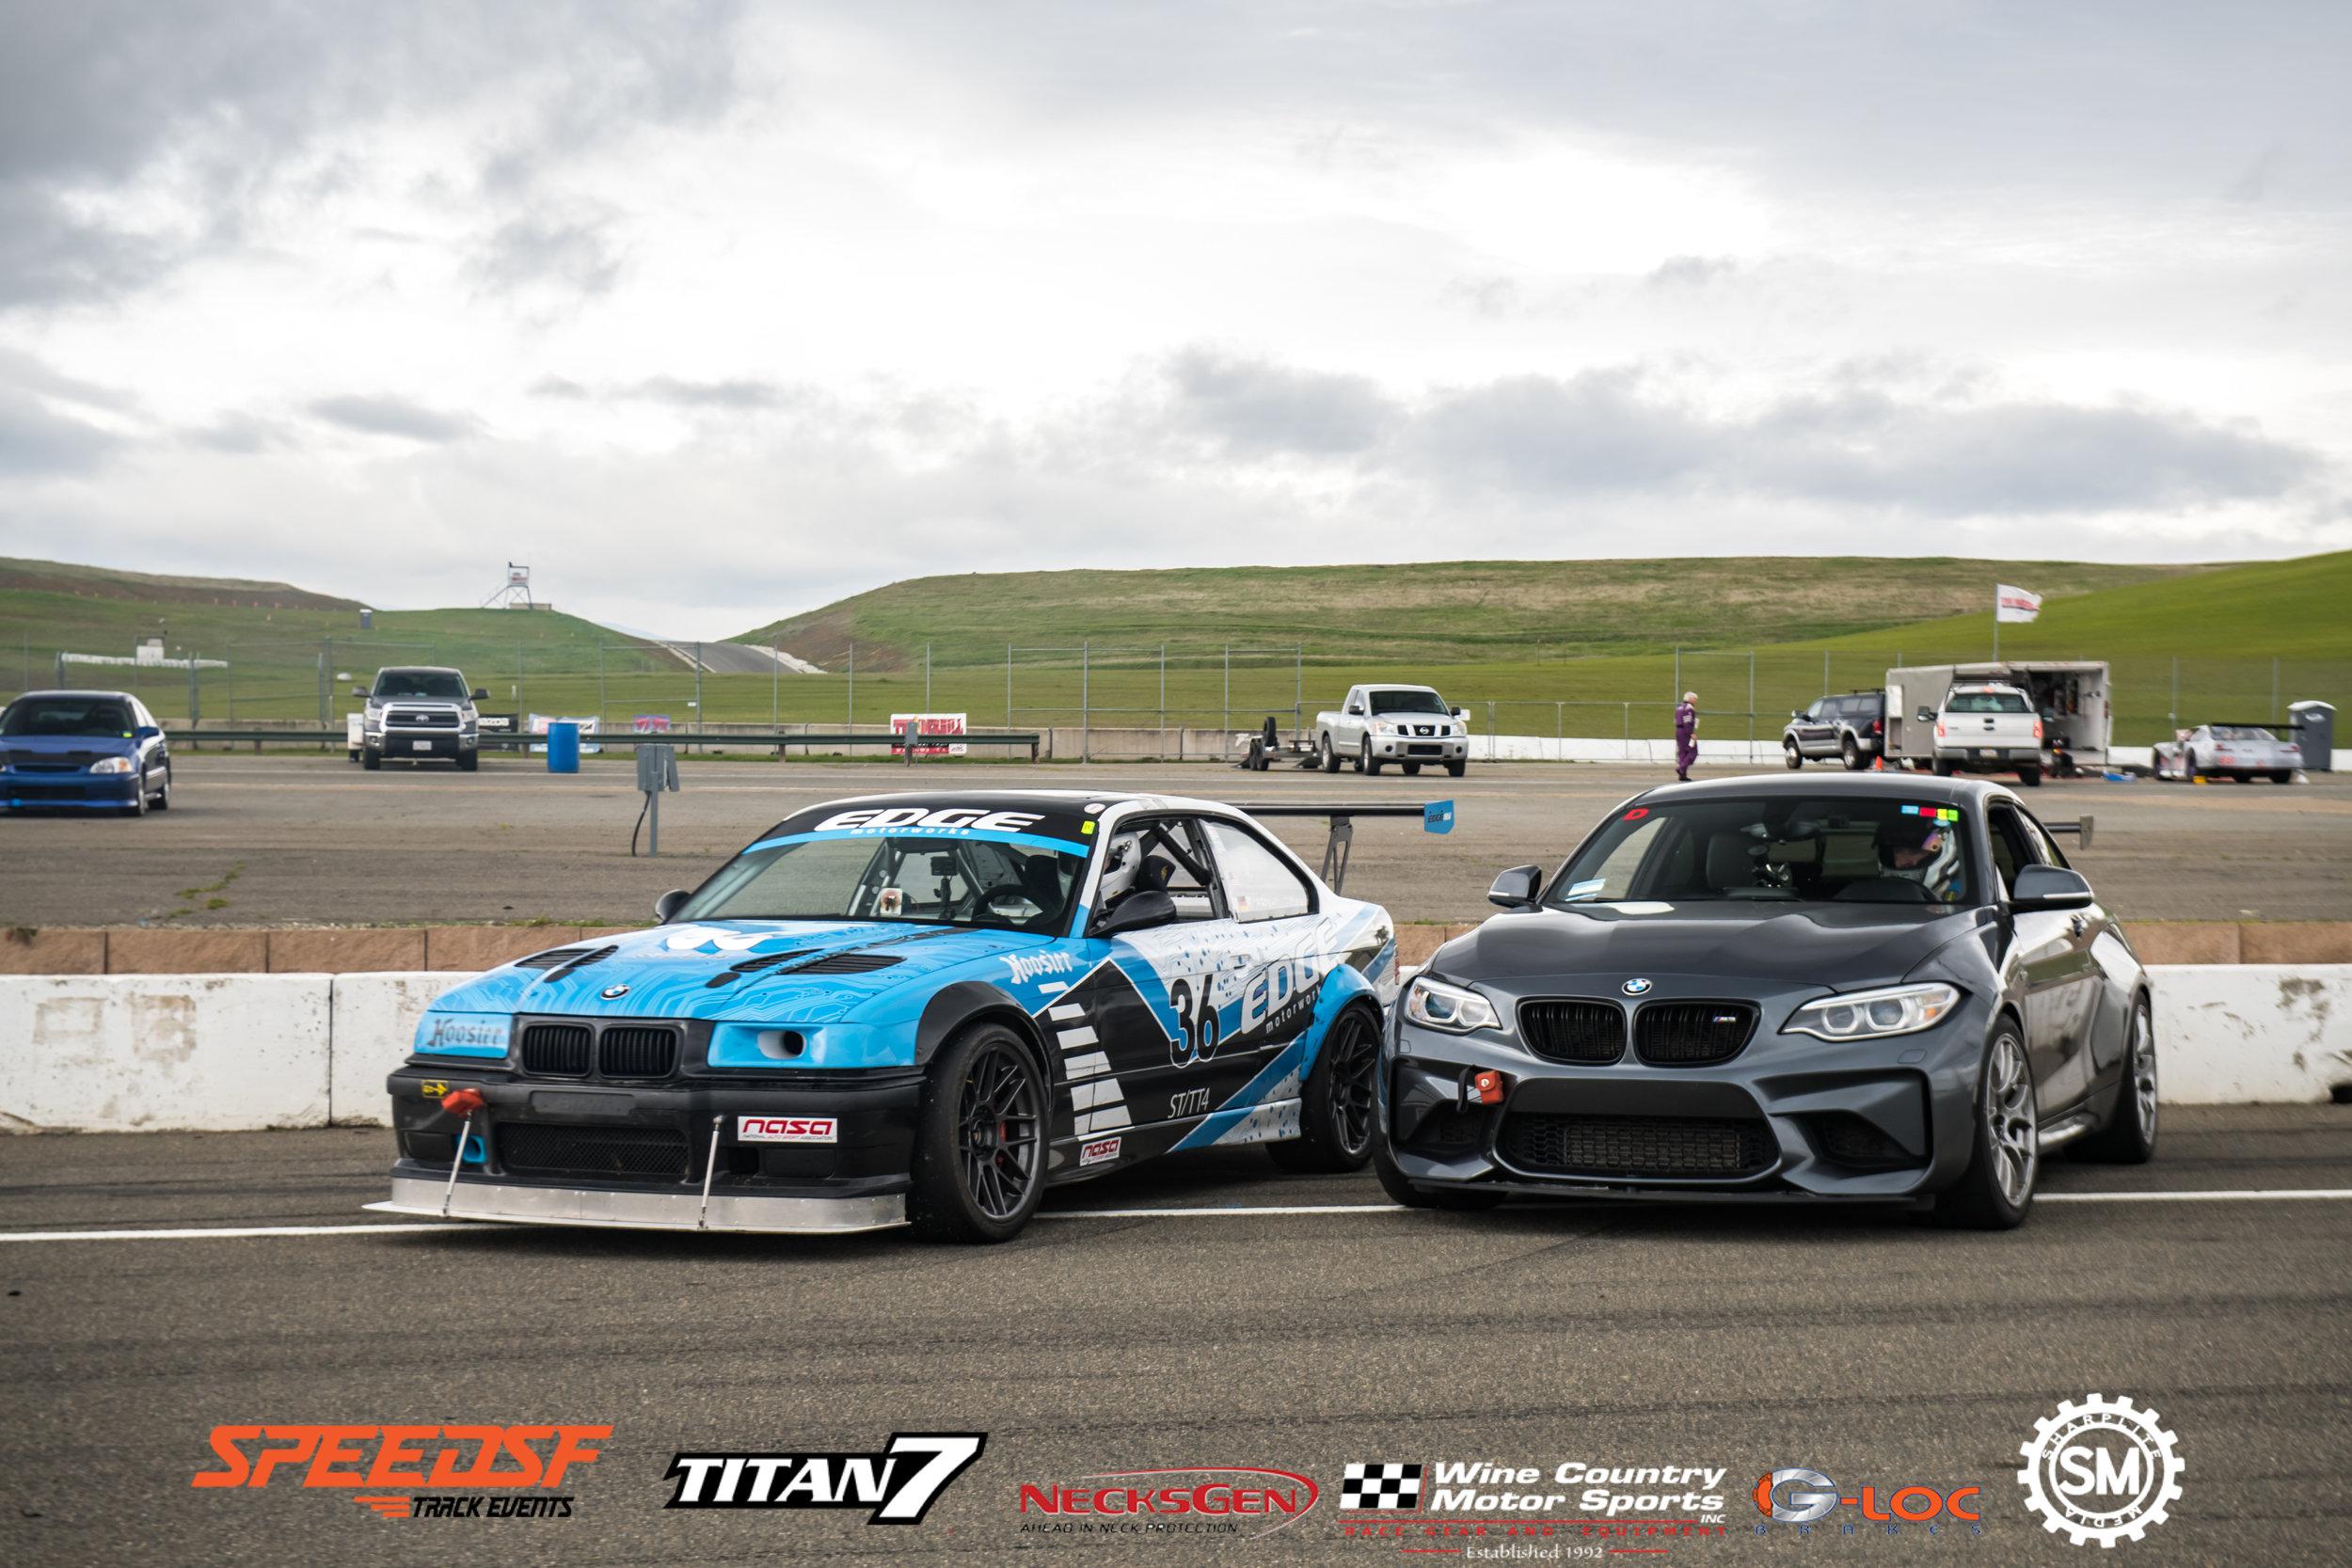 SpeedSF Thunderhill Sunday 02_24_2019-39.jpg